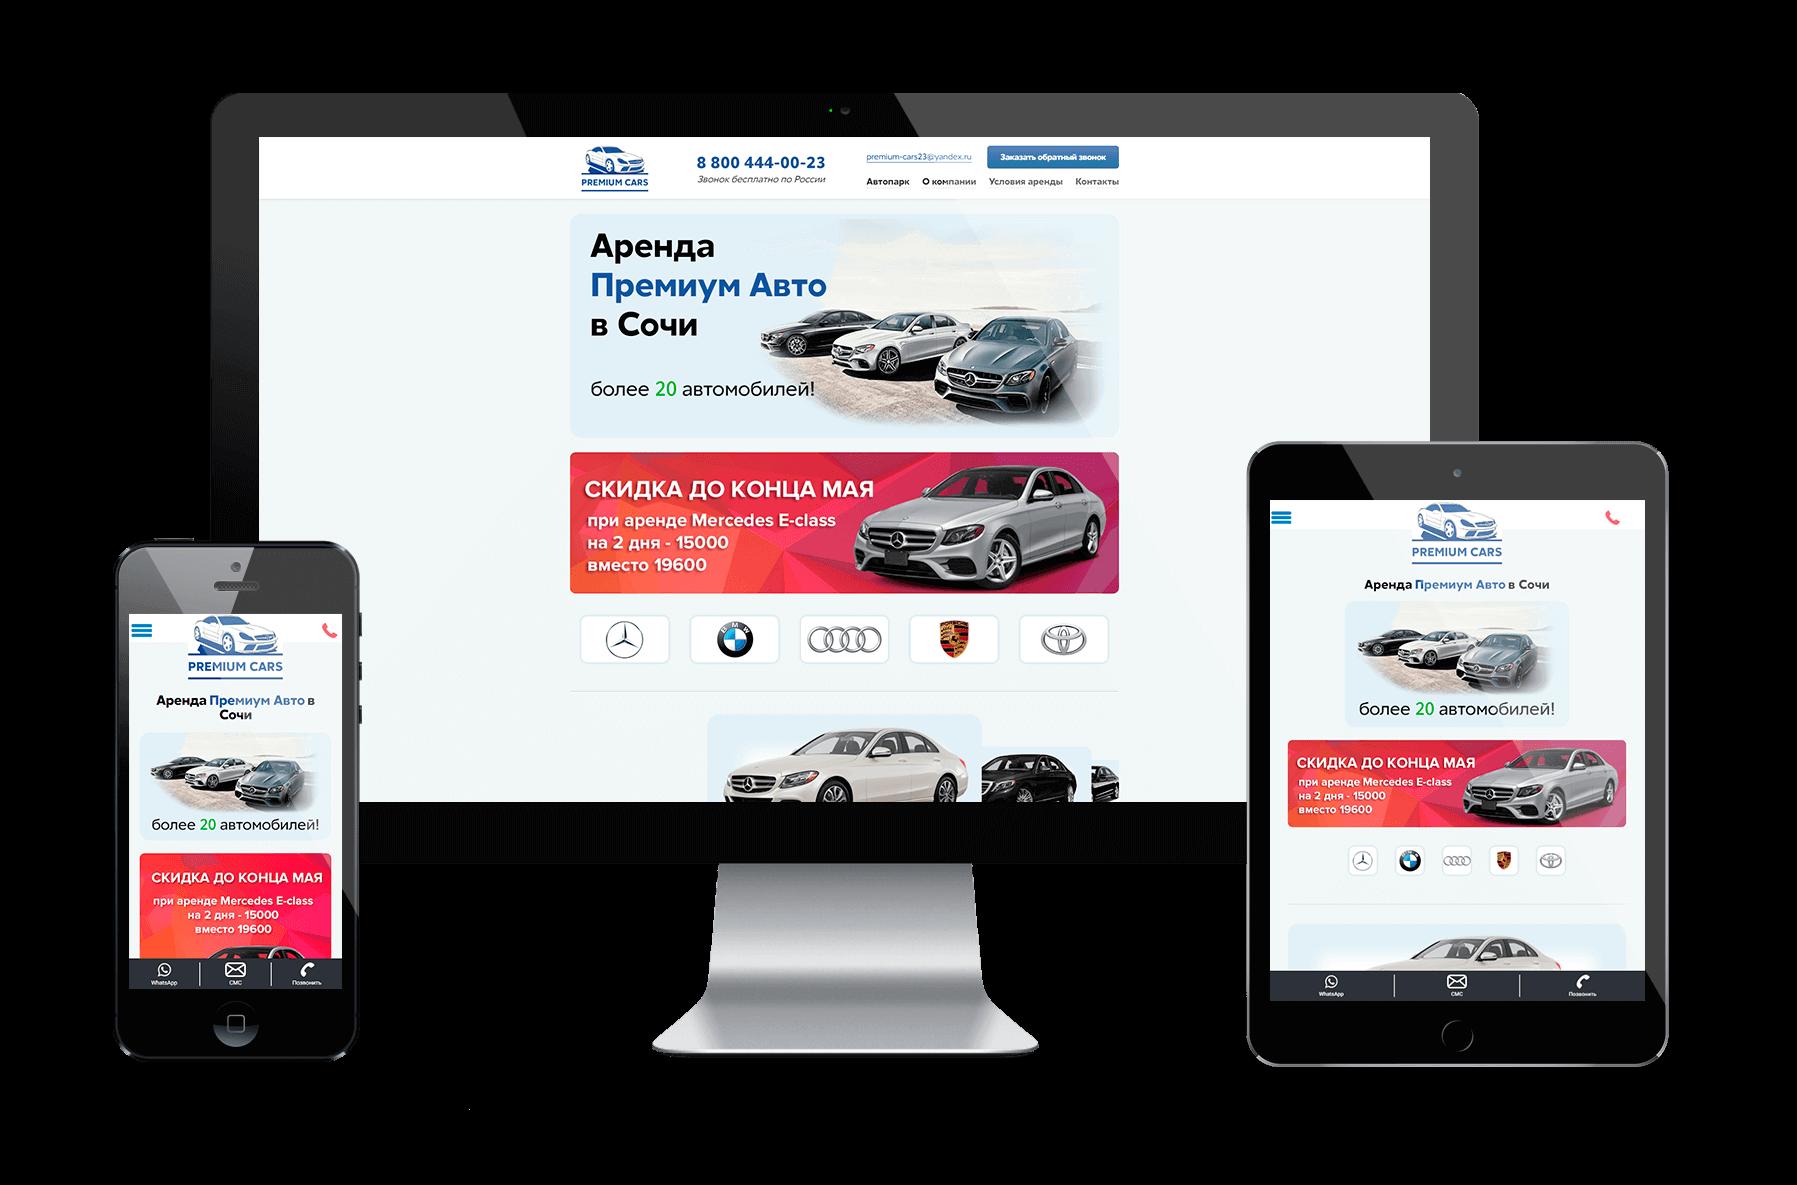 Сайт для Проката Авто в Сочи